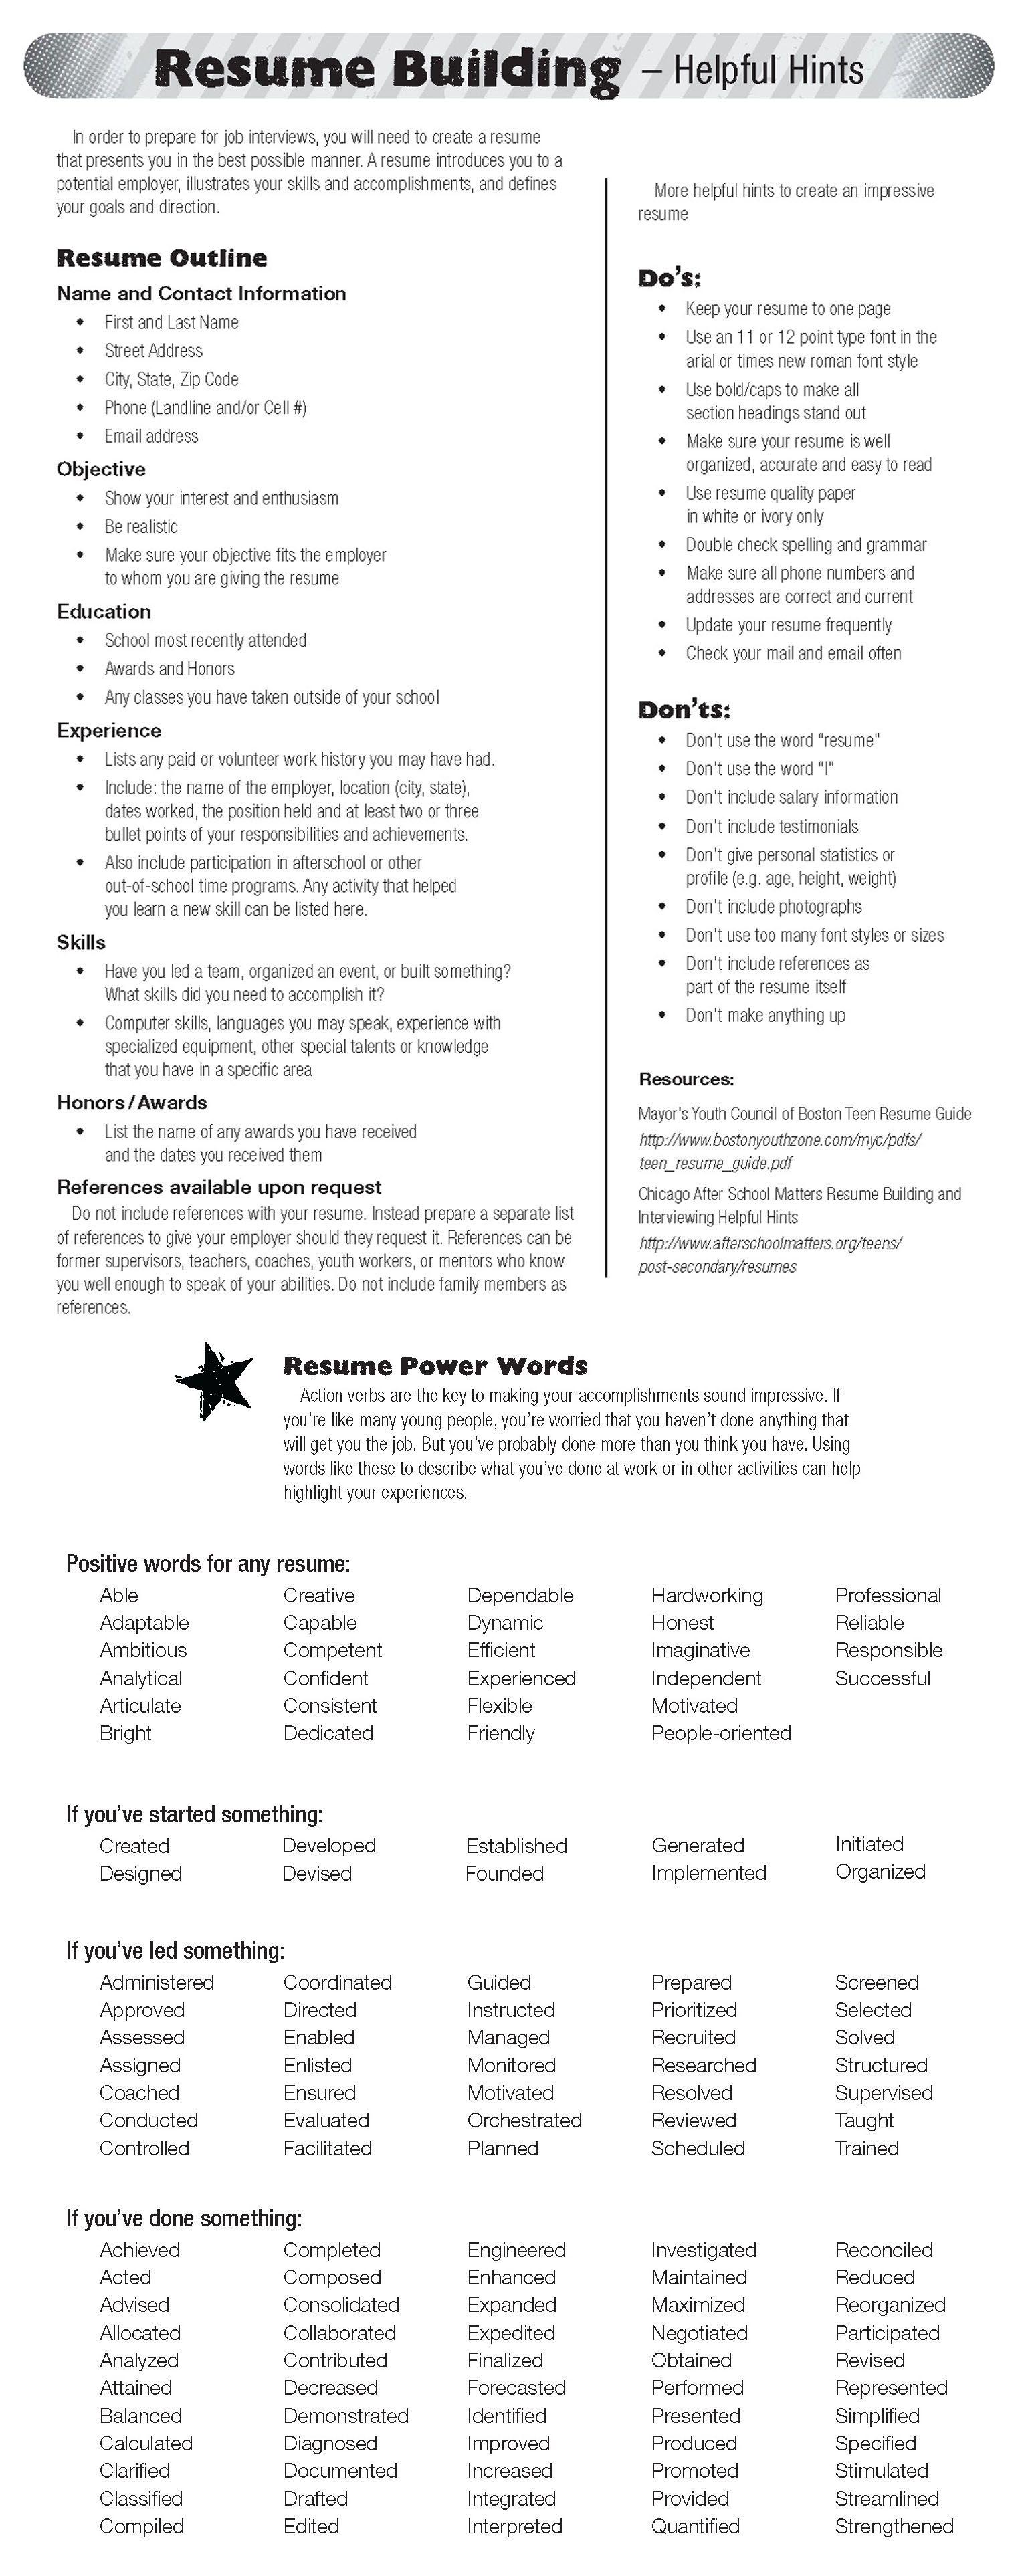 Resume, 21st century learning and 21st century on Pinterest